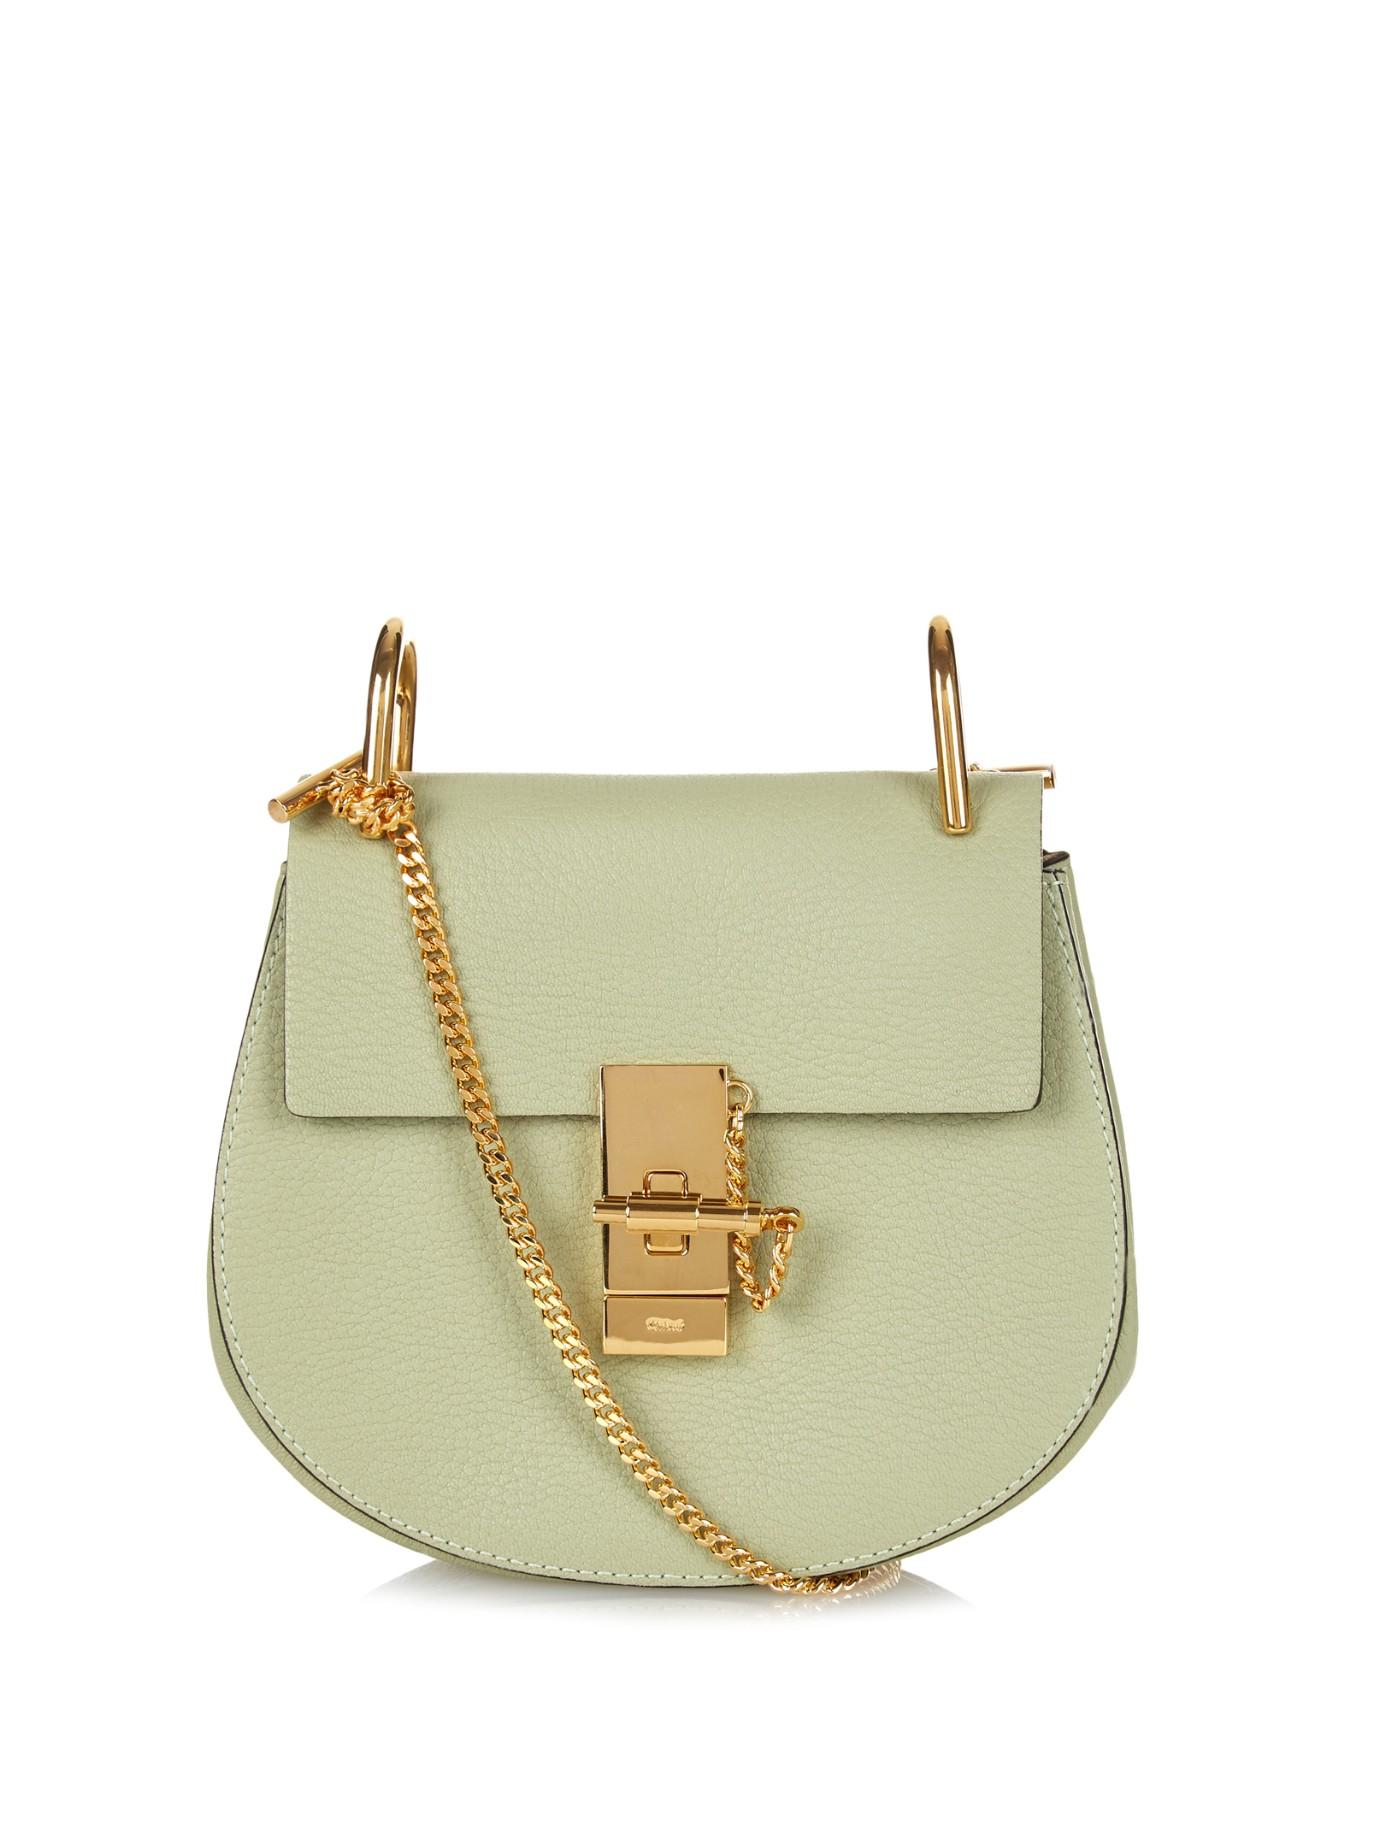 fake chloe bag - Chlo�� Drew Mini Leather Cross-Body Bag in Green (LIGHT GREEN) | Lyst